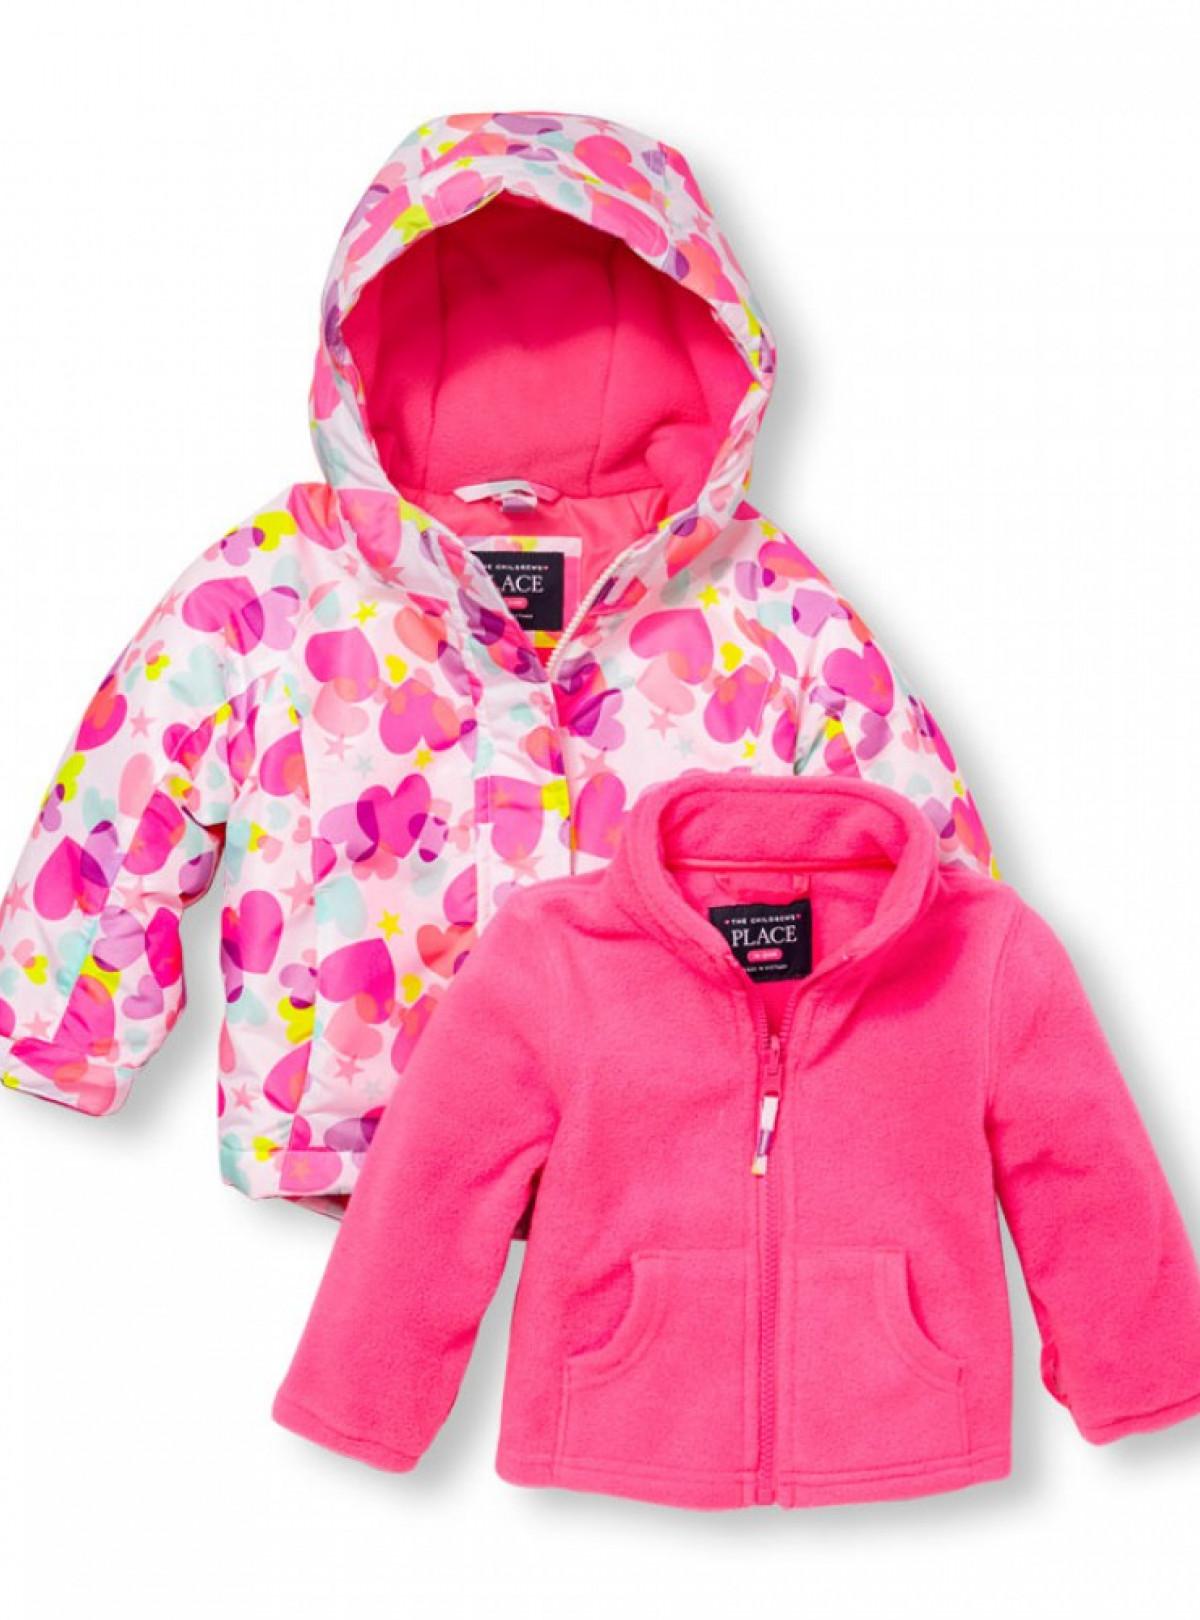 Куртка зимняя 3 в 1  The Children's Place с флиской сердечки   1176